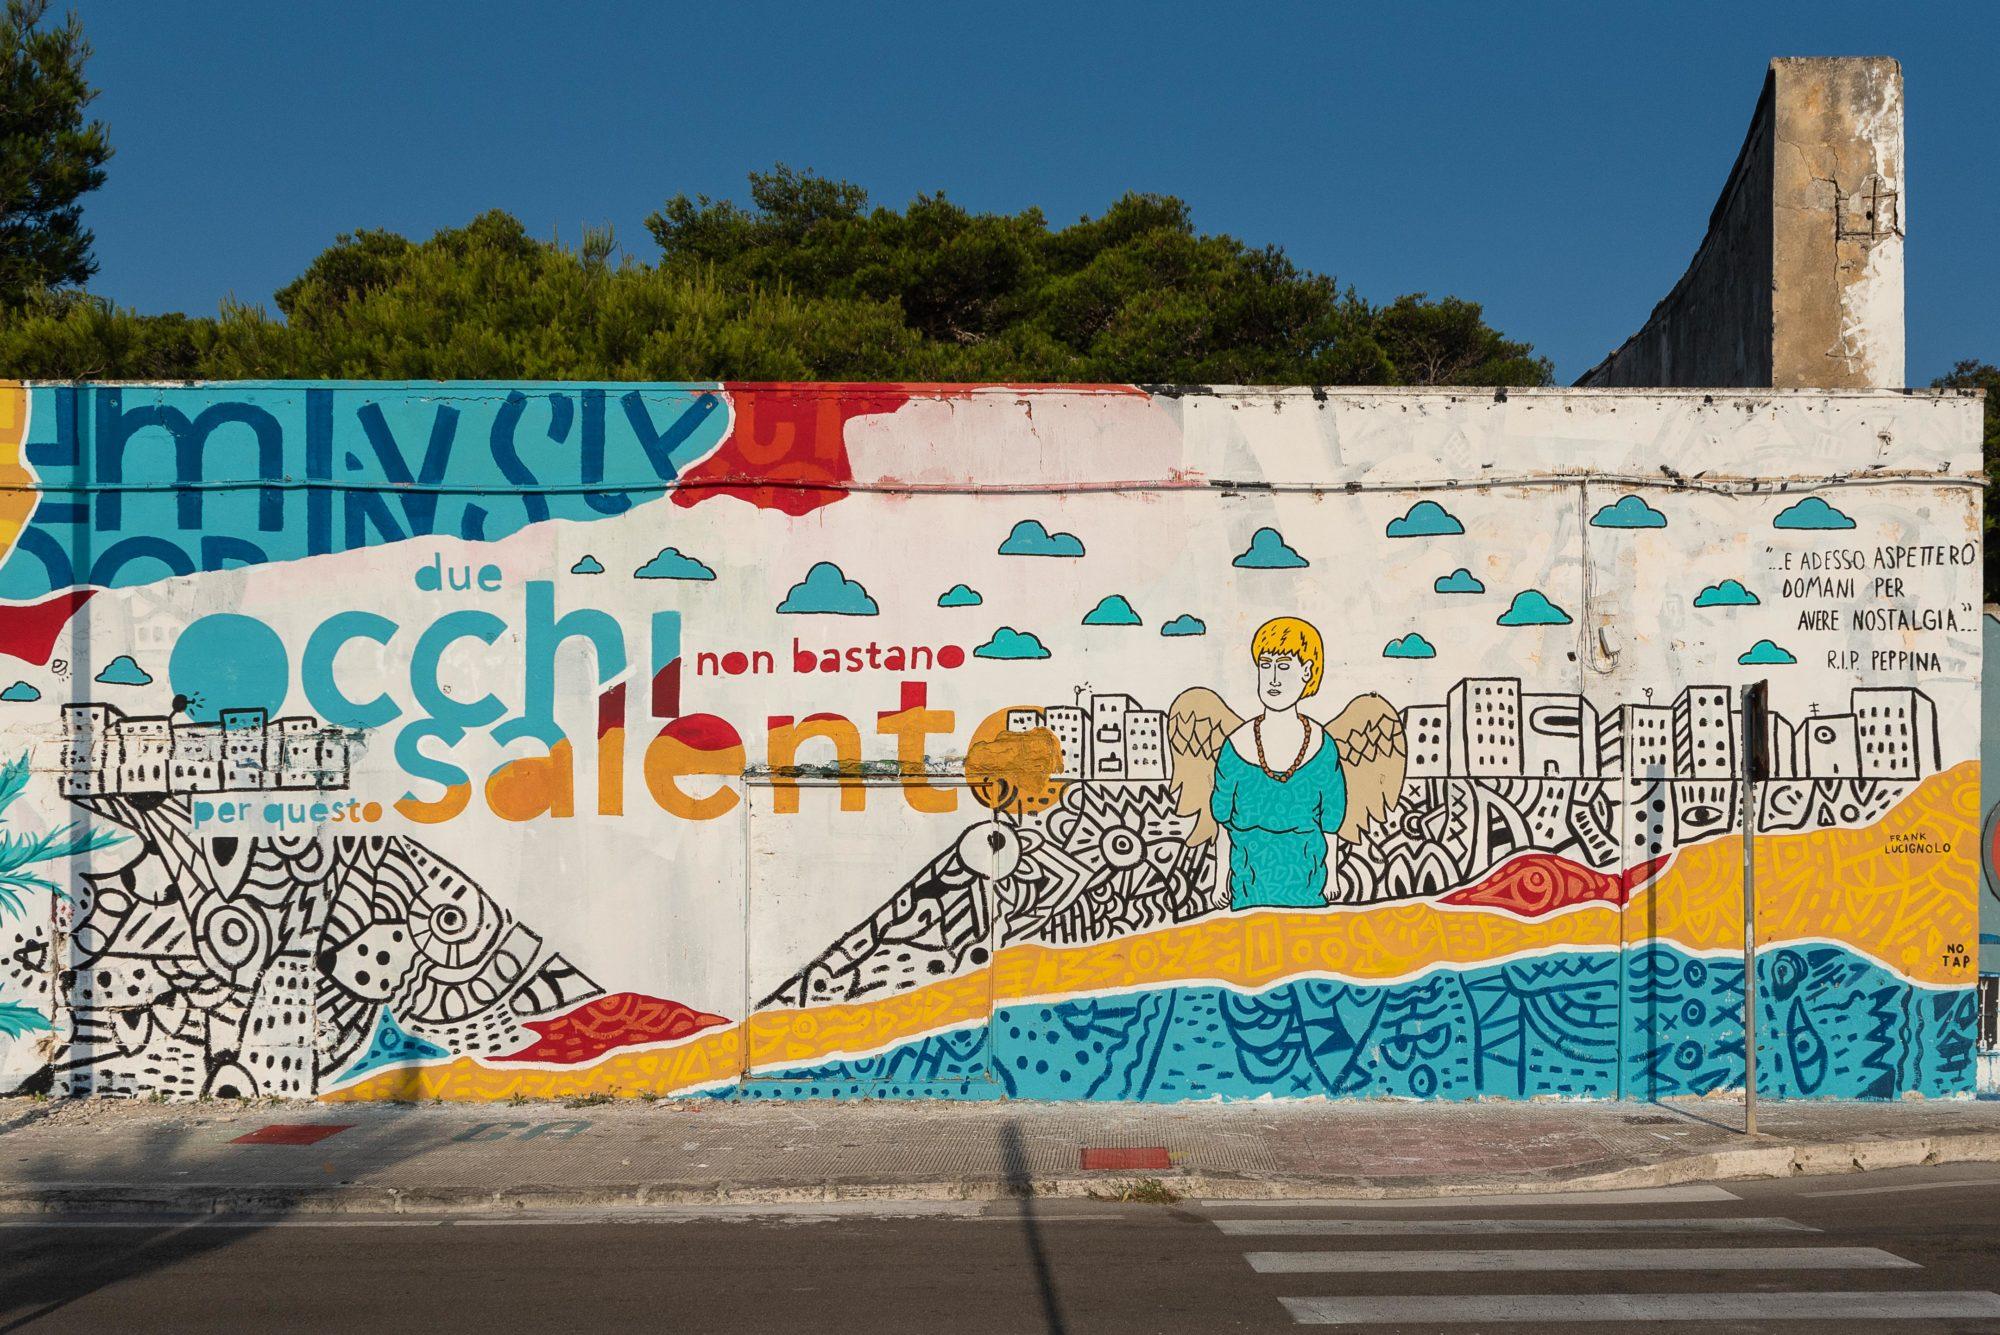 Frank Lucignolo - Majilina - Mister Caos  - Foto di Walls Of Milano